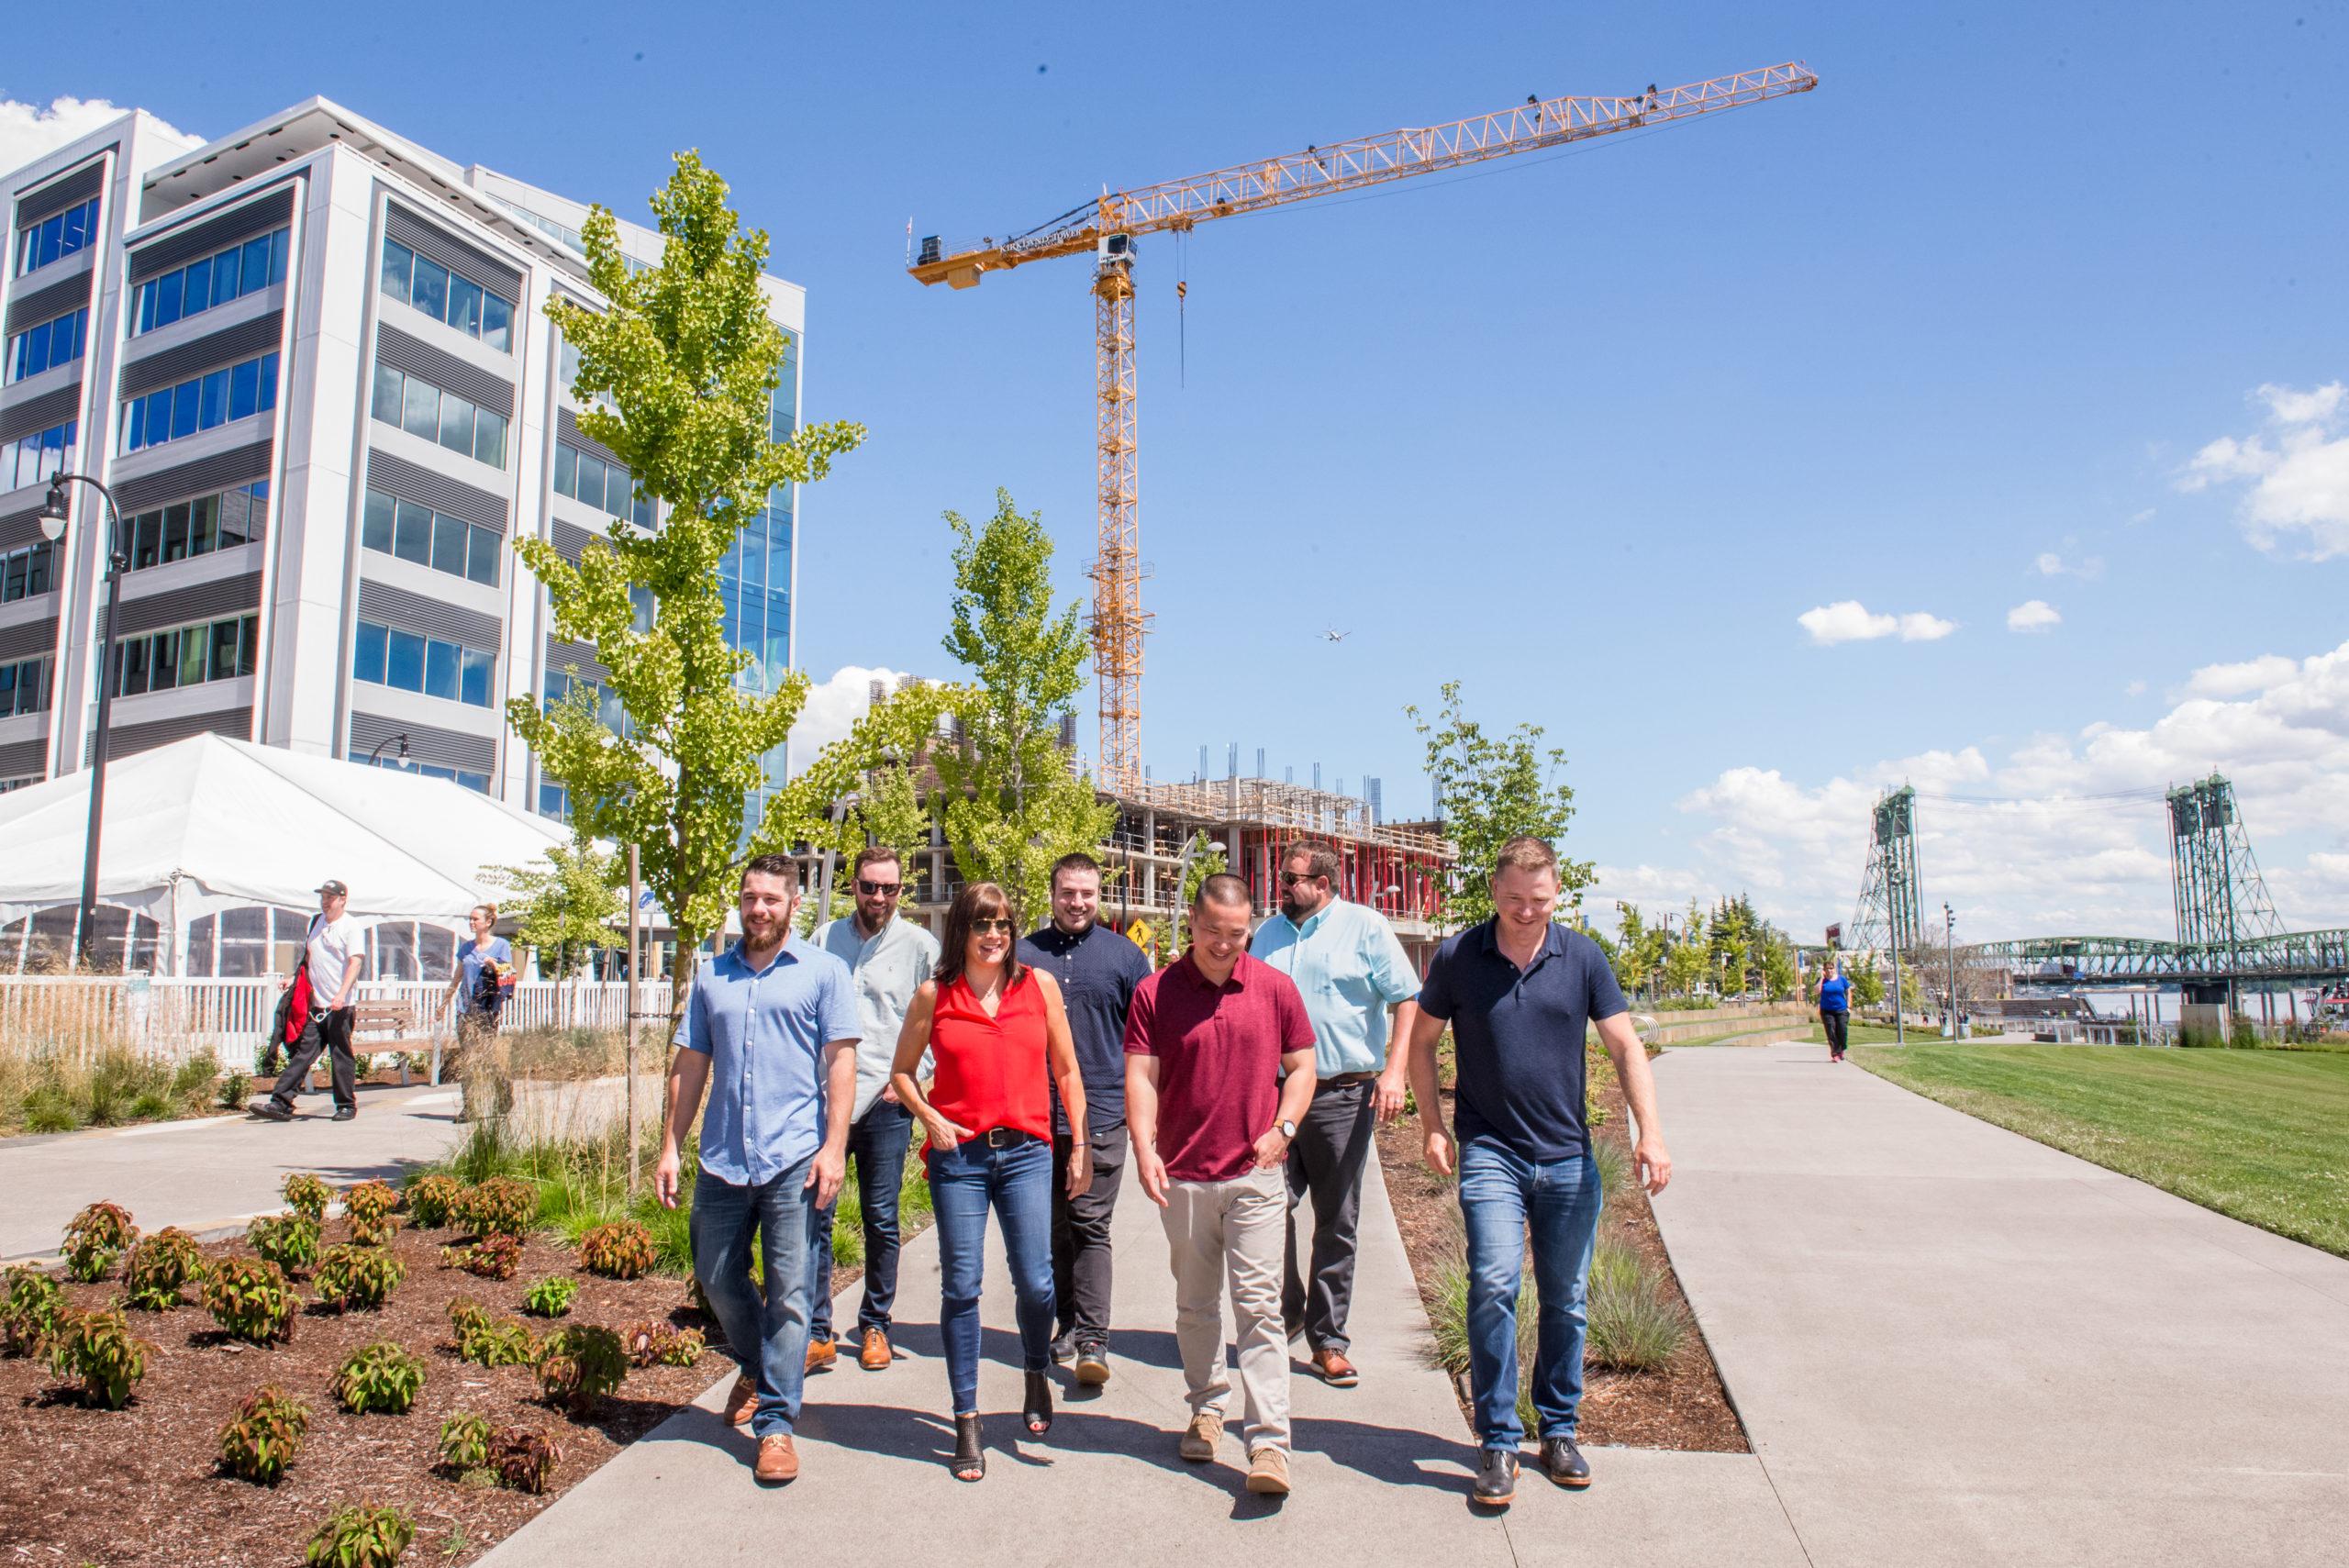 brand marketing consultant in vancouver Washington camas Washington portland Oregon vivid reveal